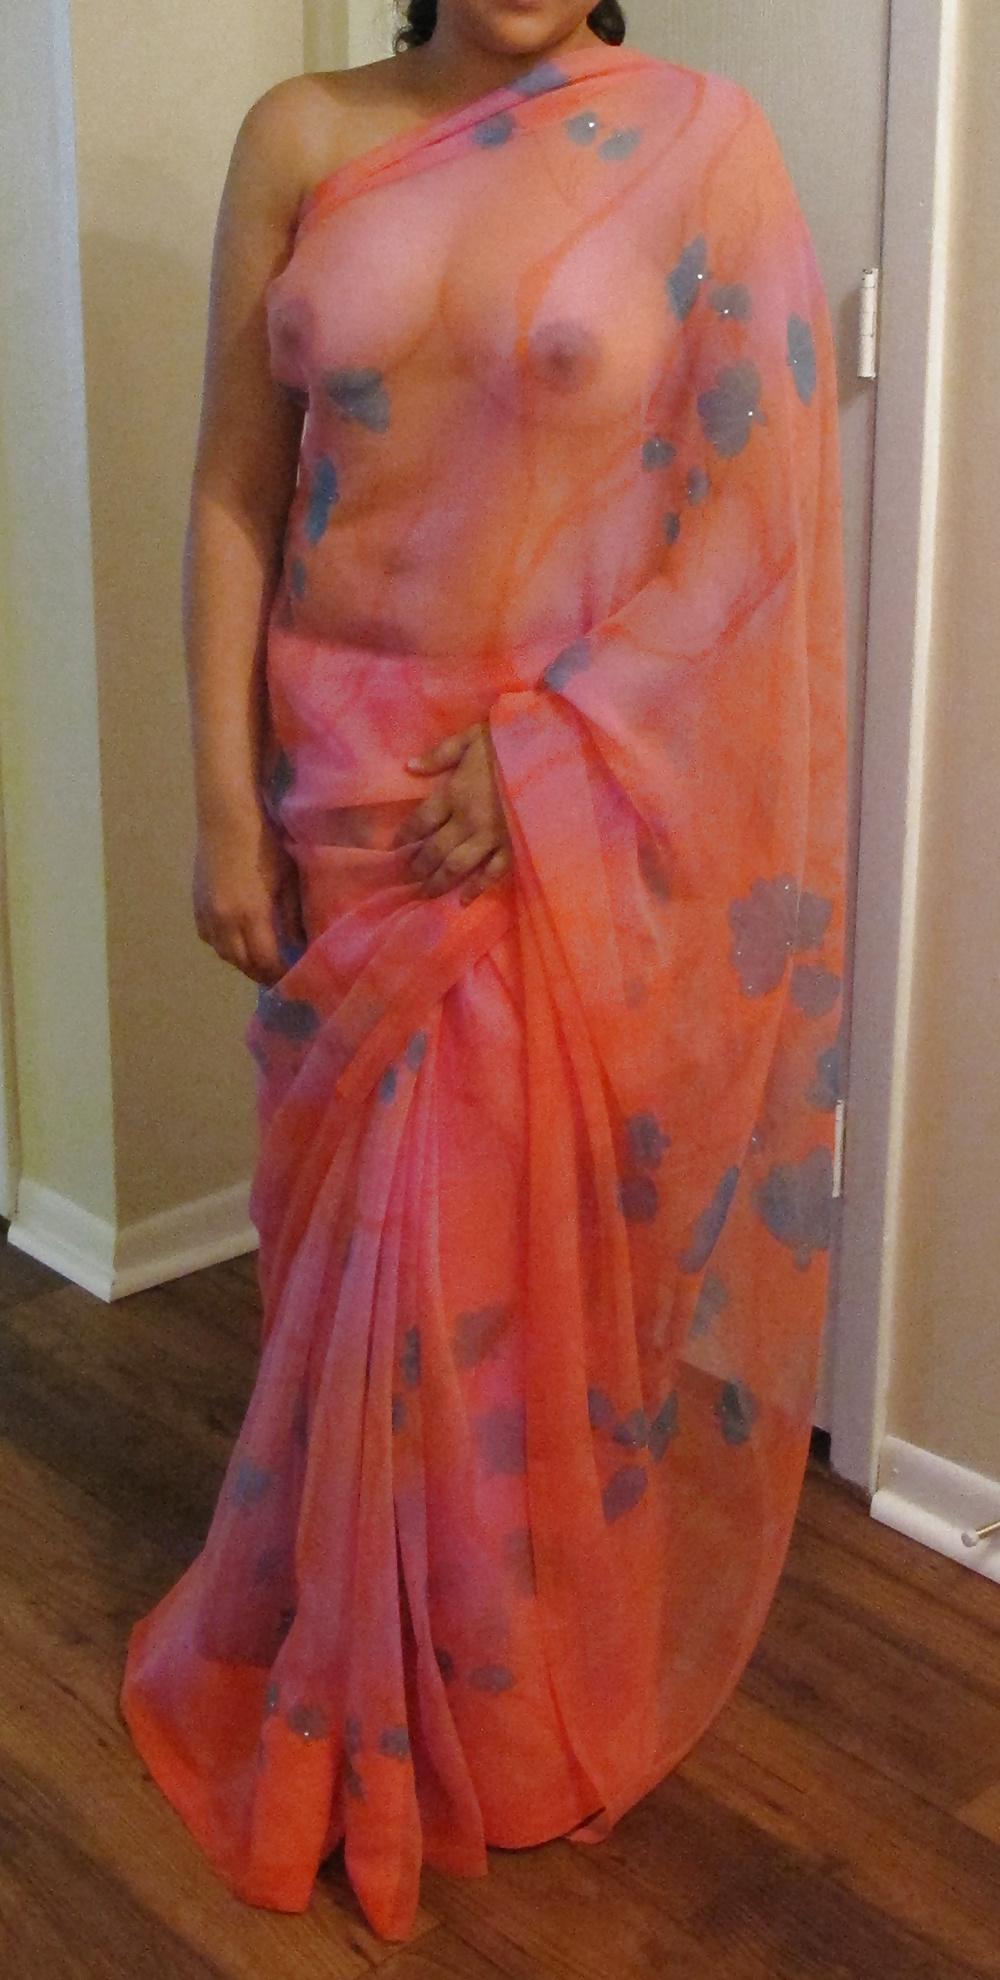 Desi bhabhi sexy pics taken by her bubby photo